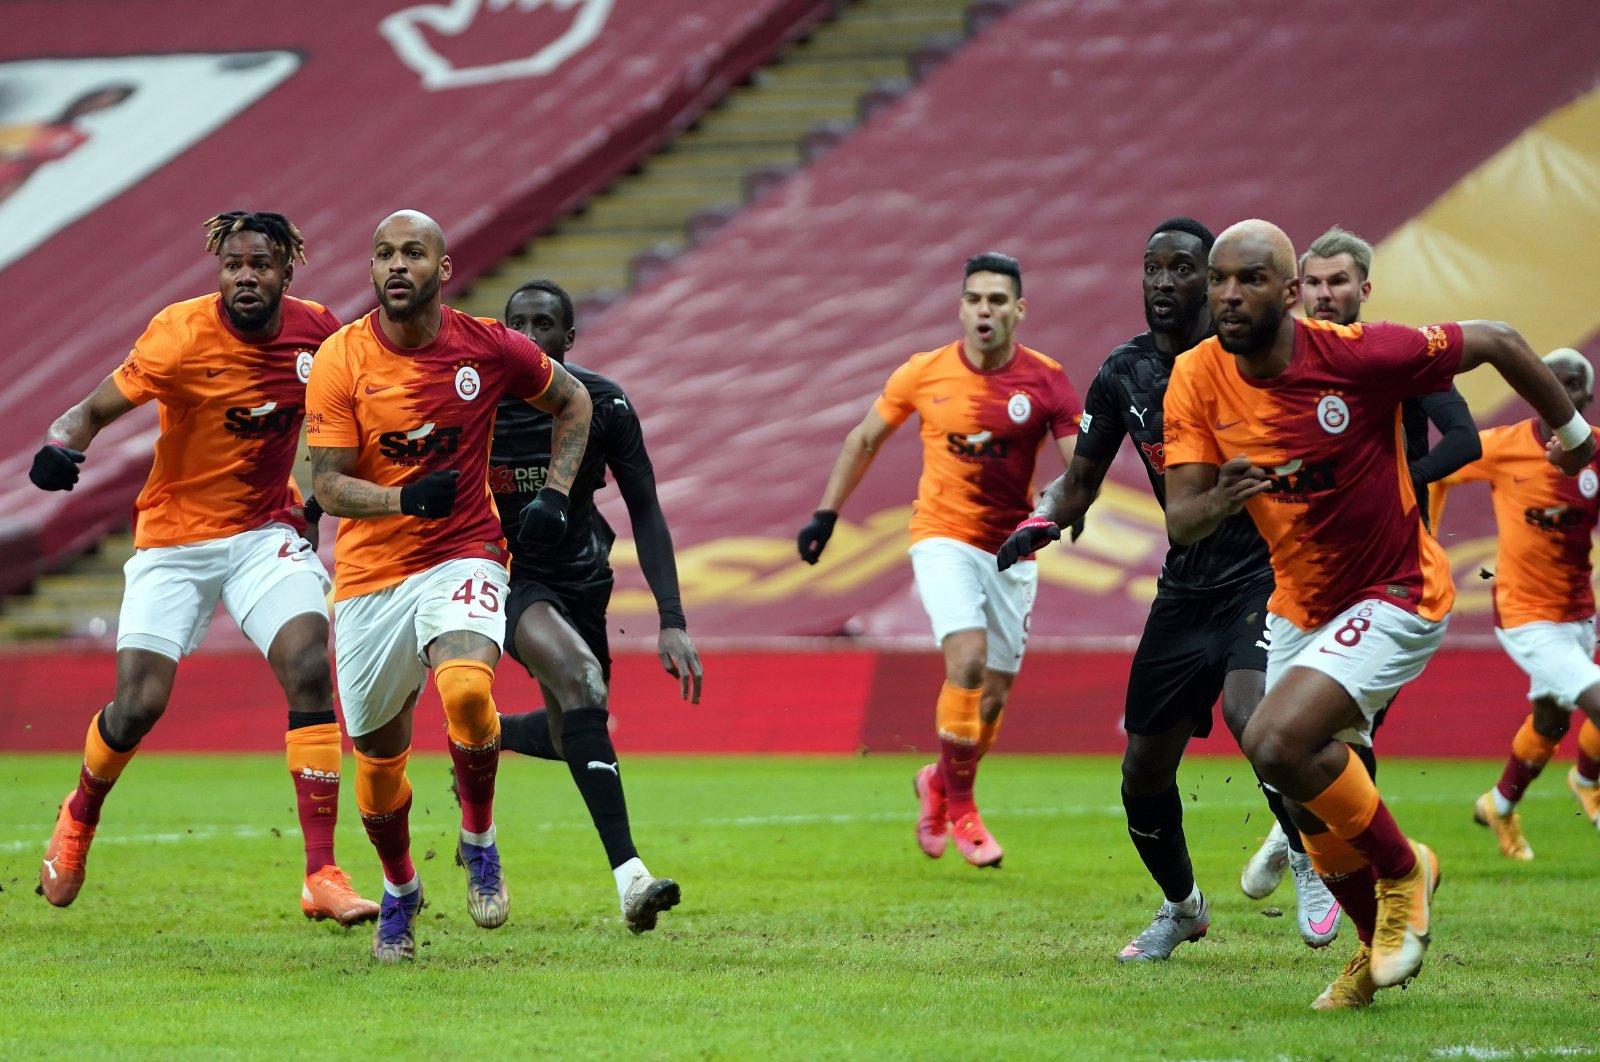 Galatasaray was held to a shocking 2-2 draw against Demir Grup Sivasspor. (IHA Photo)